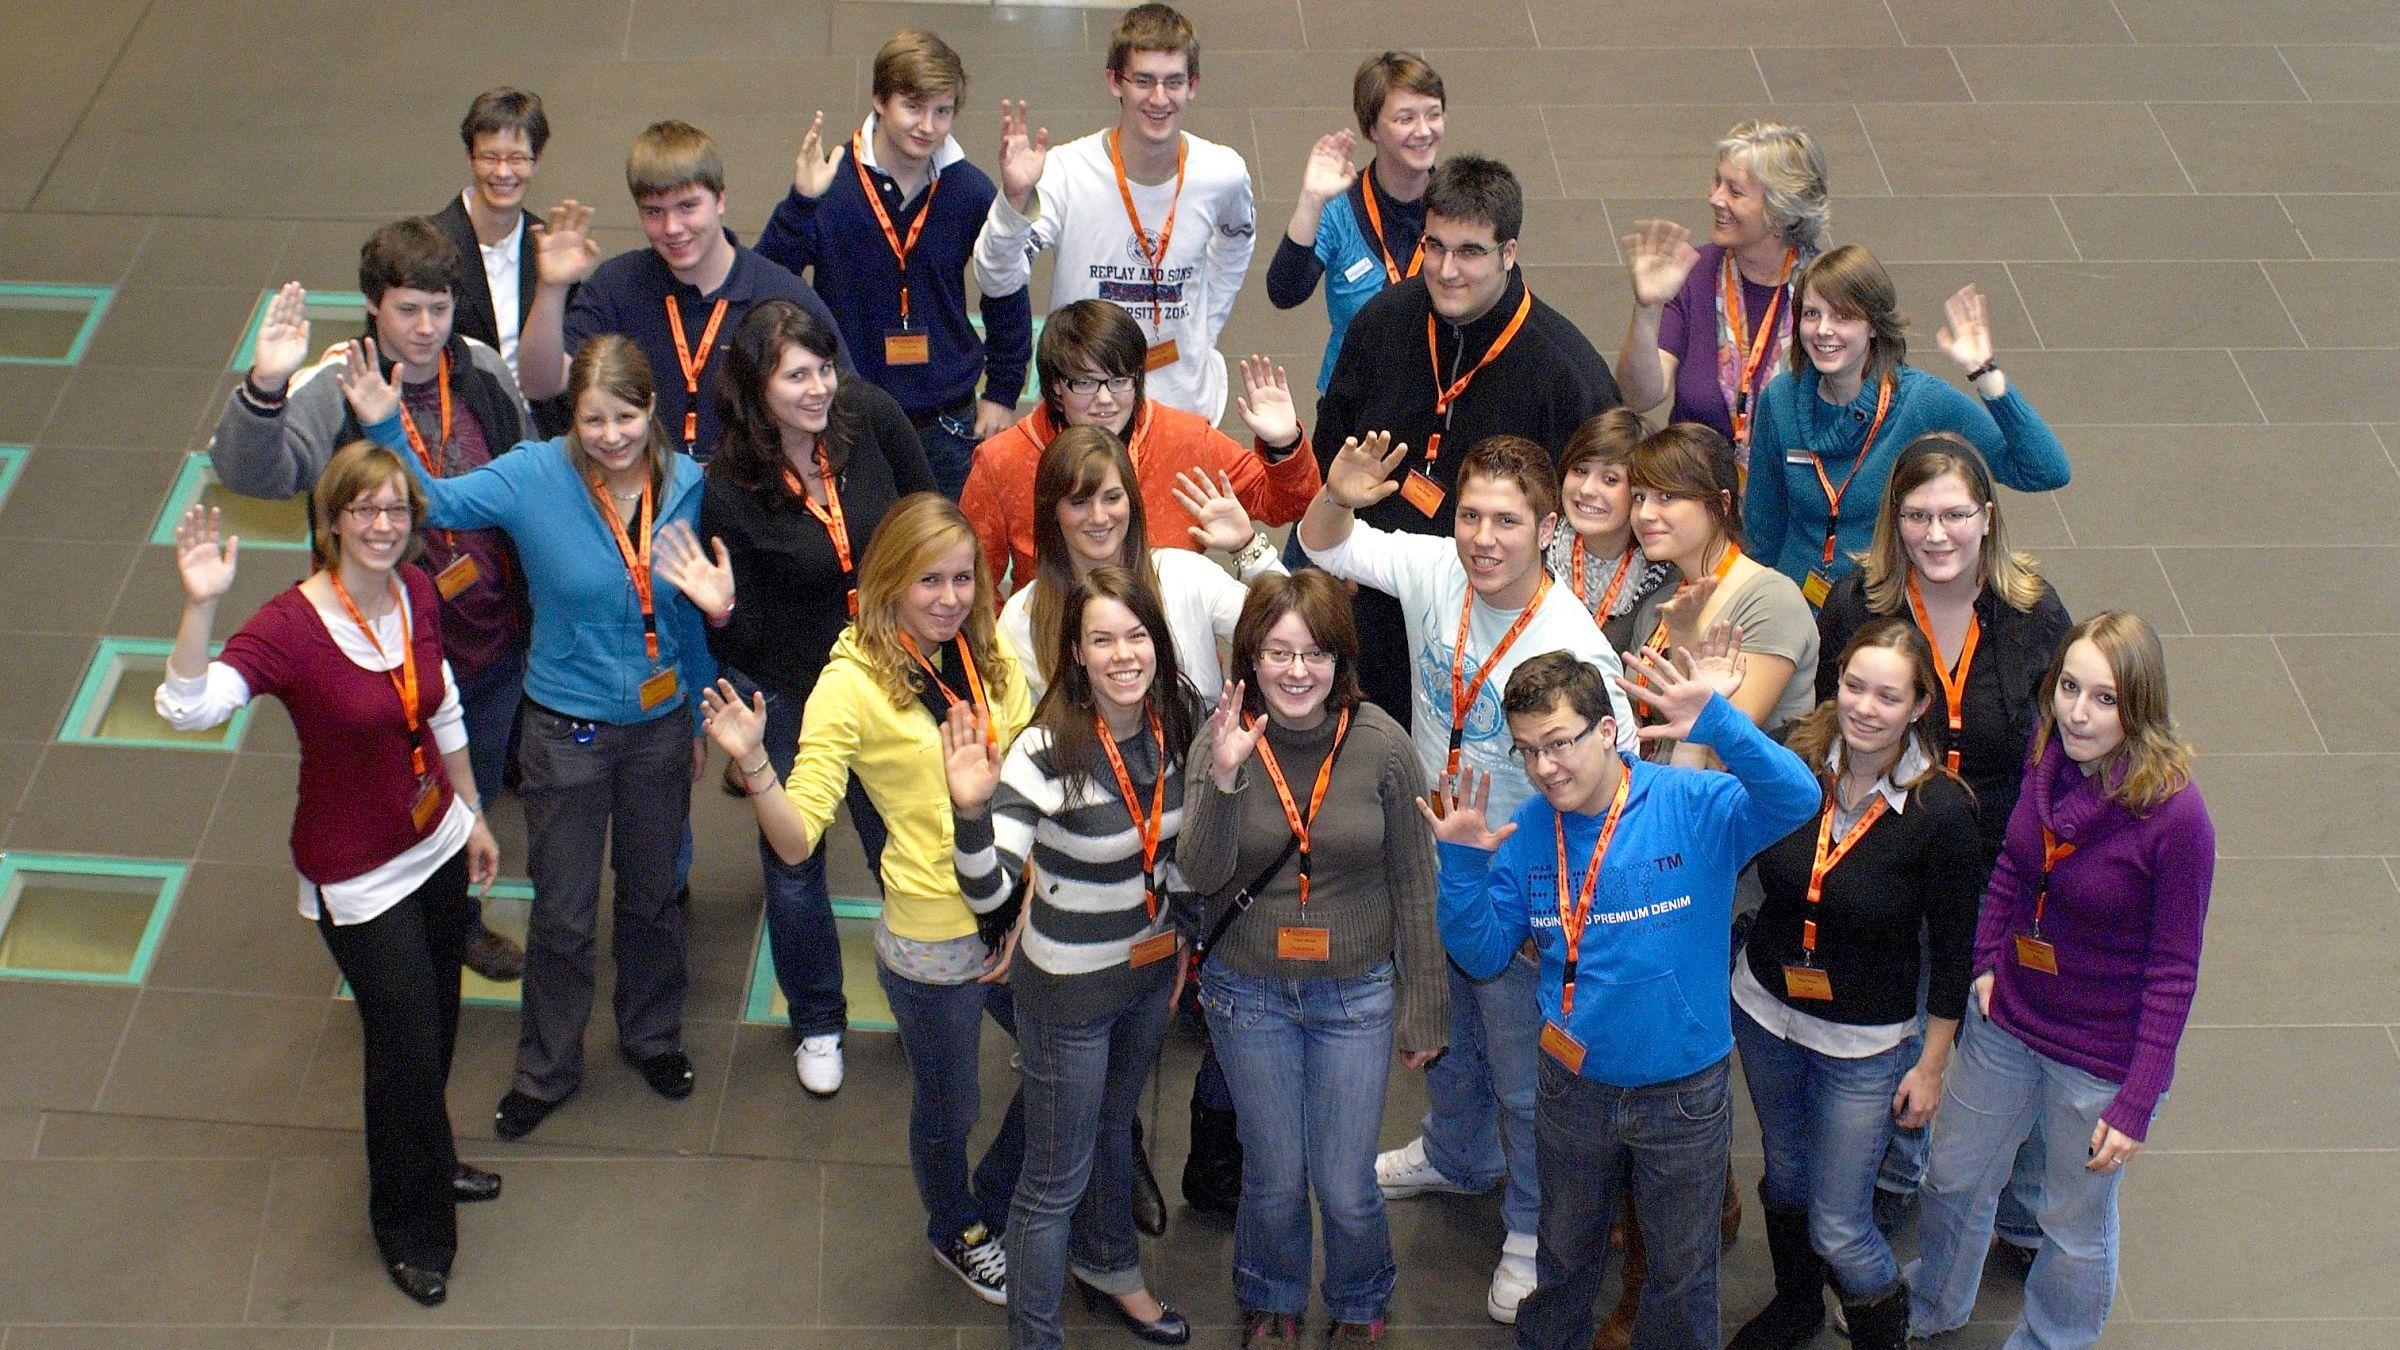 Gruppenfoto der TeenGroup 2008/2009